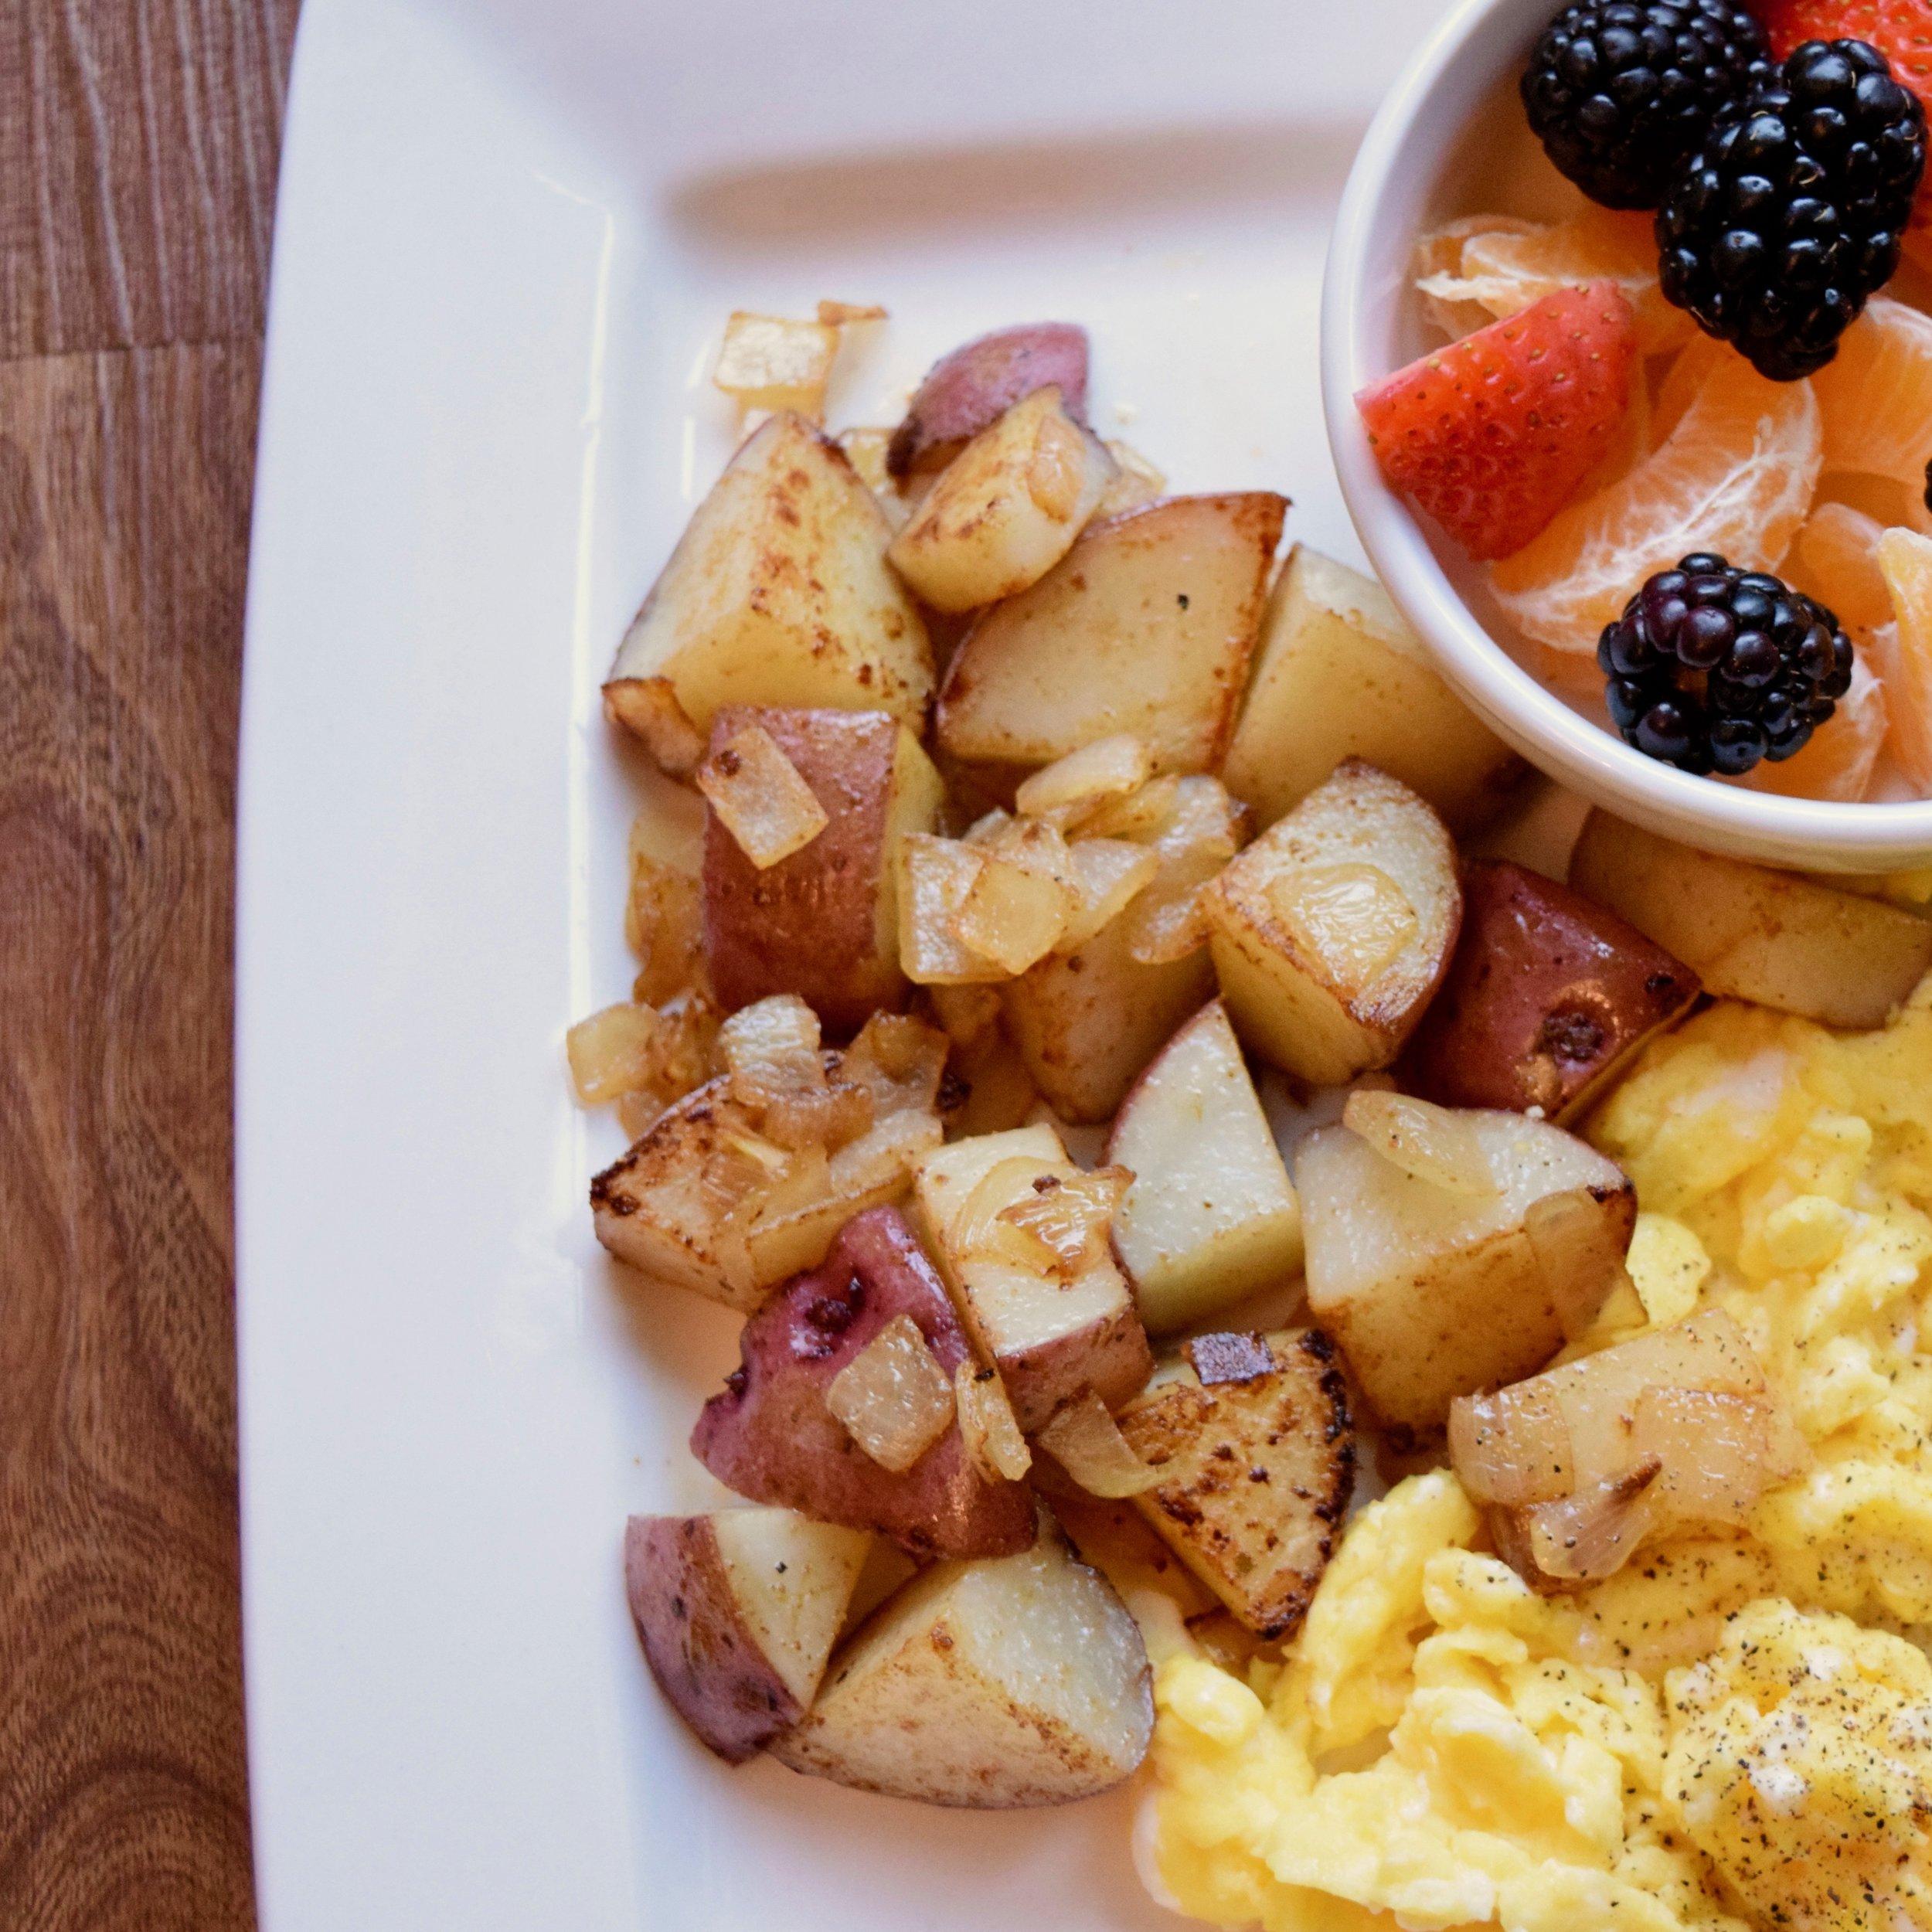 Nutrition Education Background - Breakfast